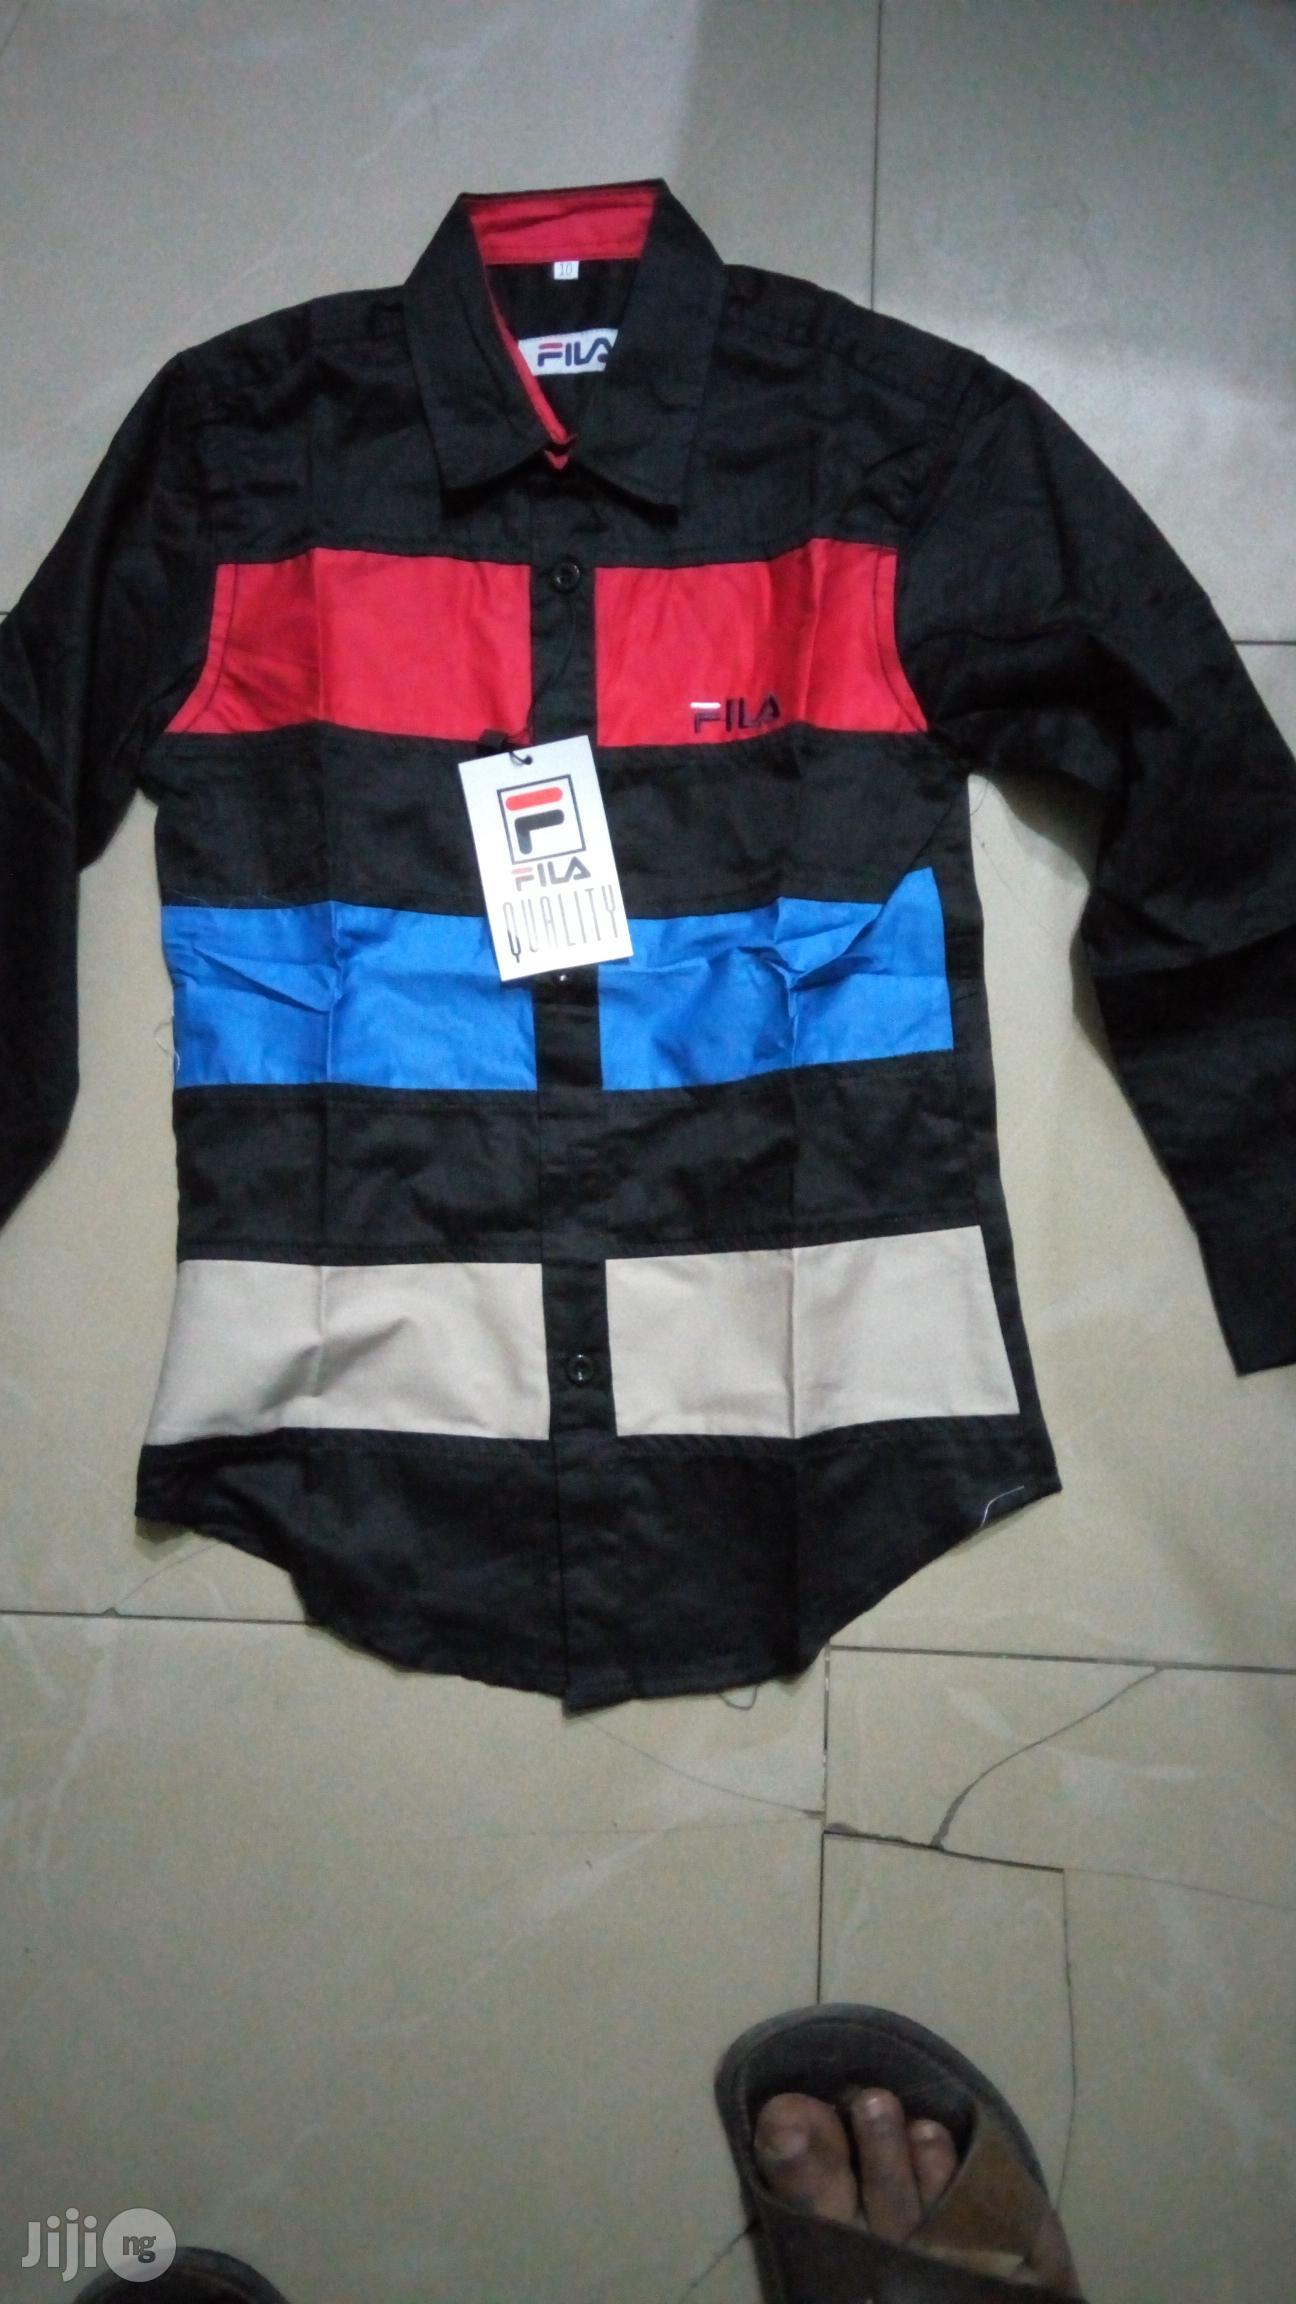 FILAS Boys Shirt